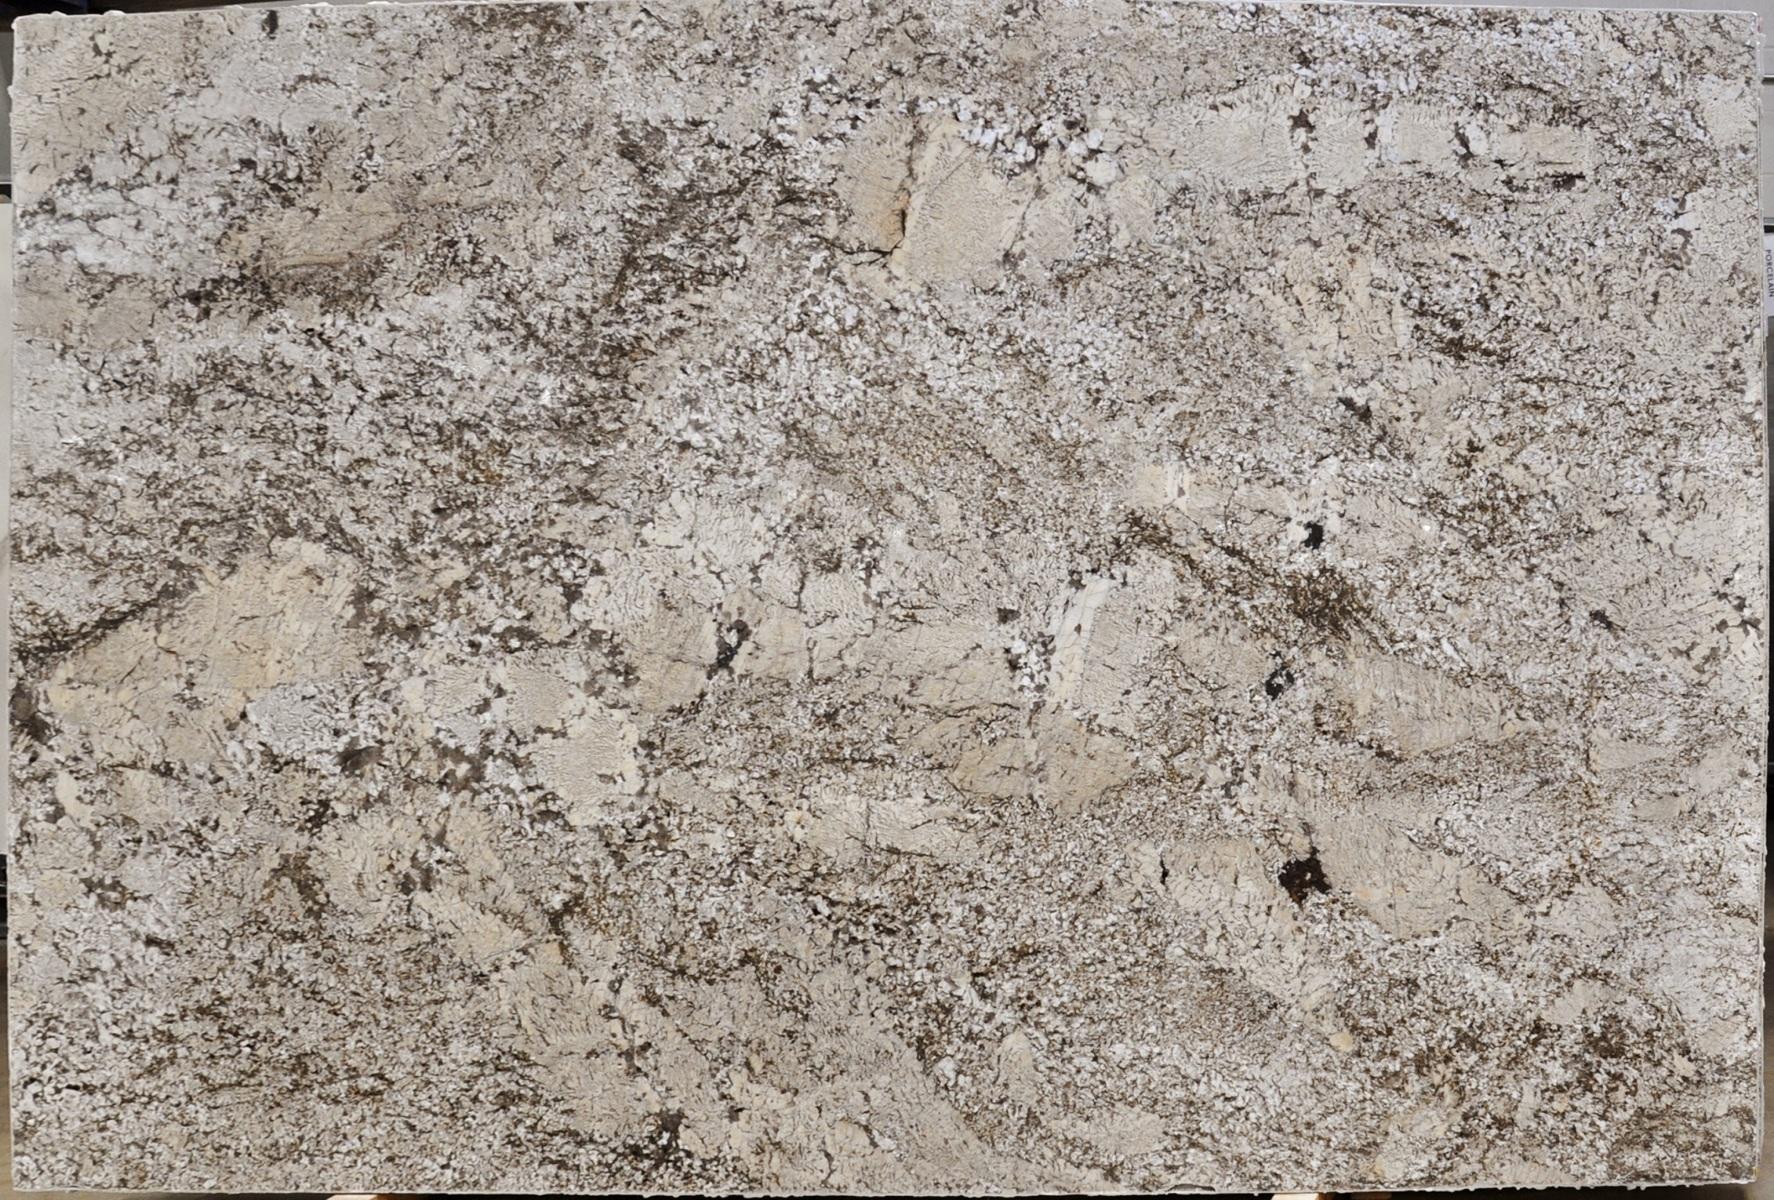 White Sand 3 cm lot (3)